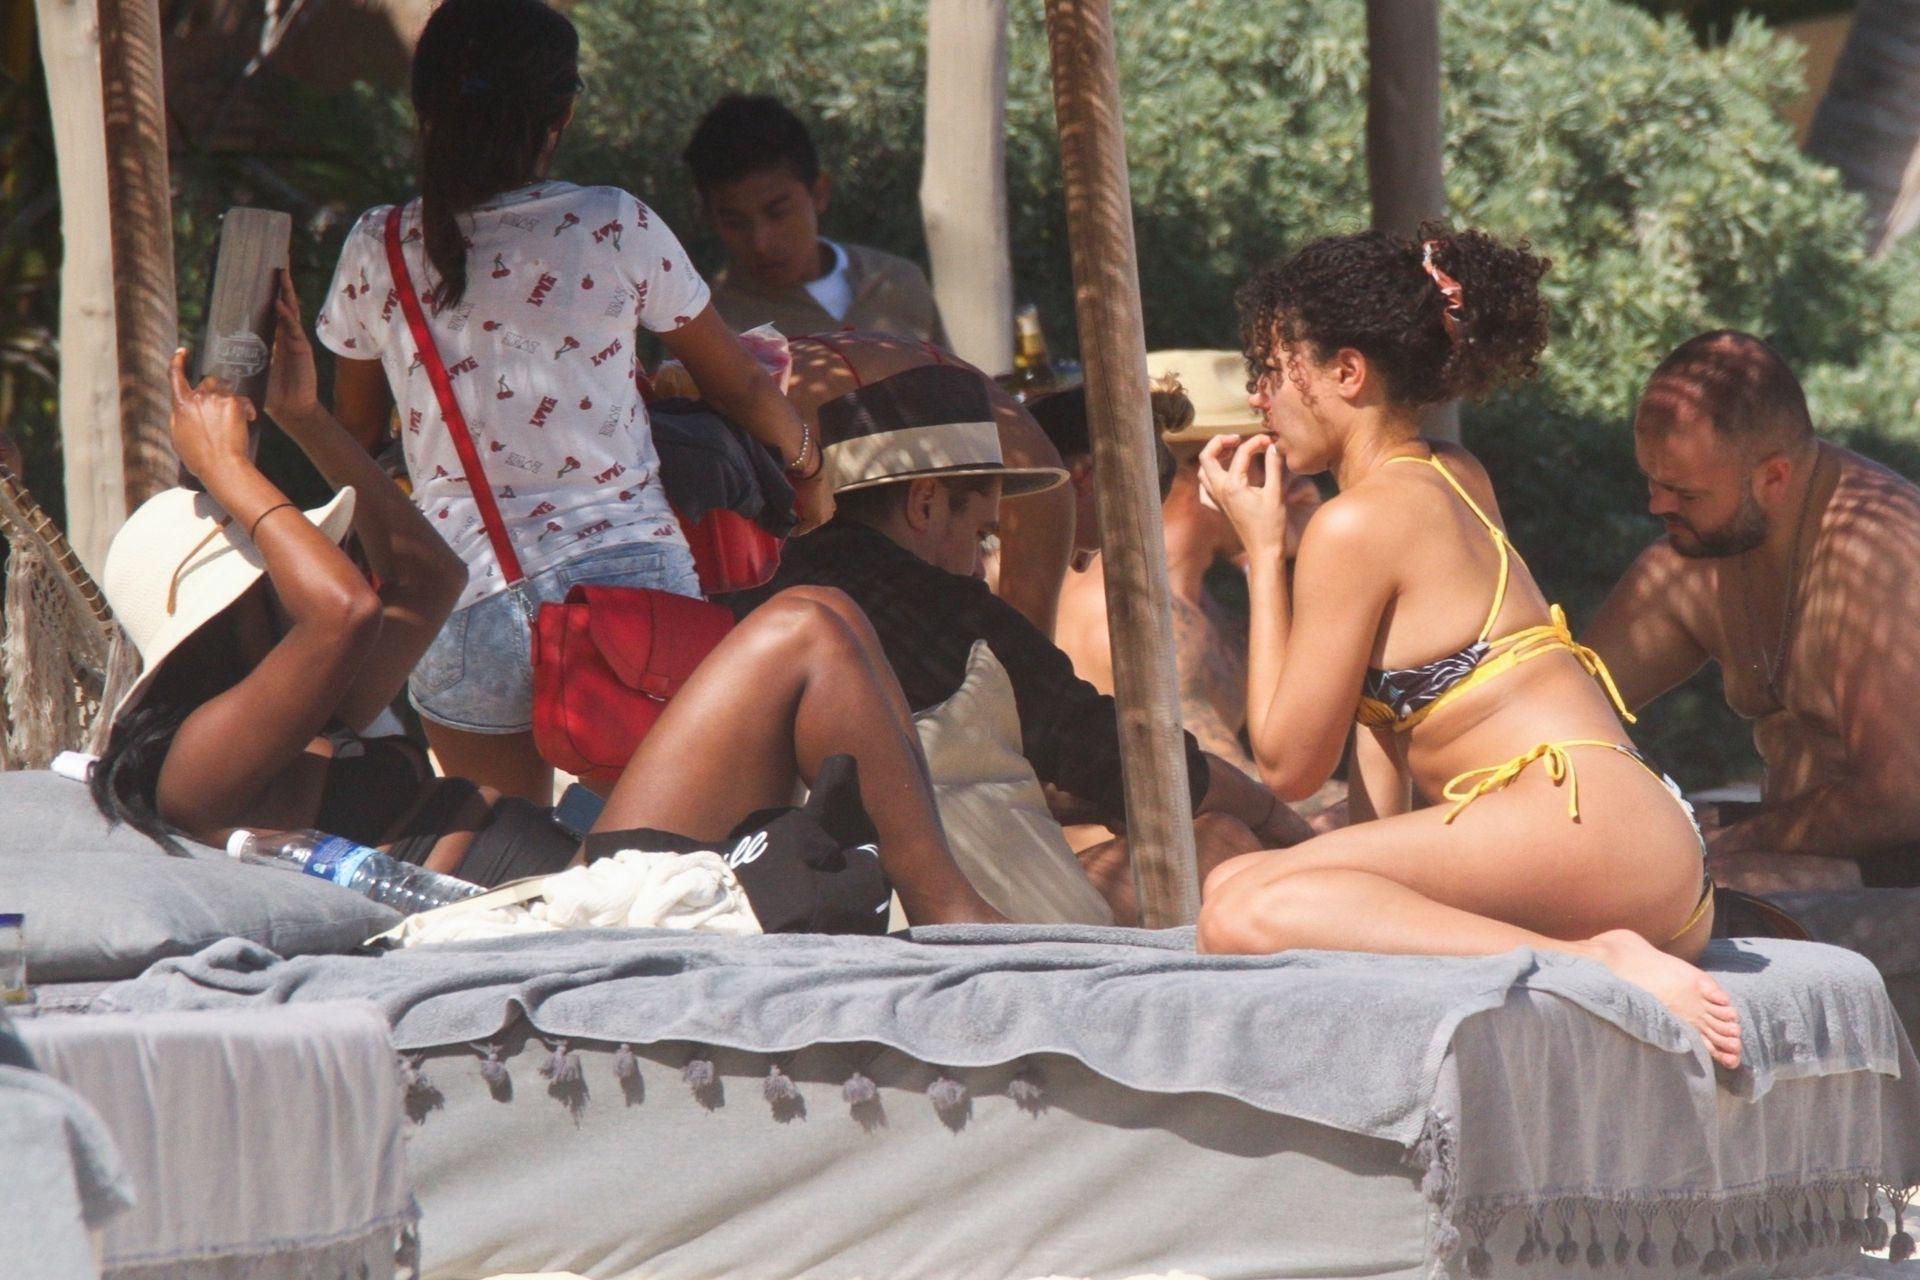 Alisha Wainwright Enjoys A Sun Filled Getaway In Tulum 0043